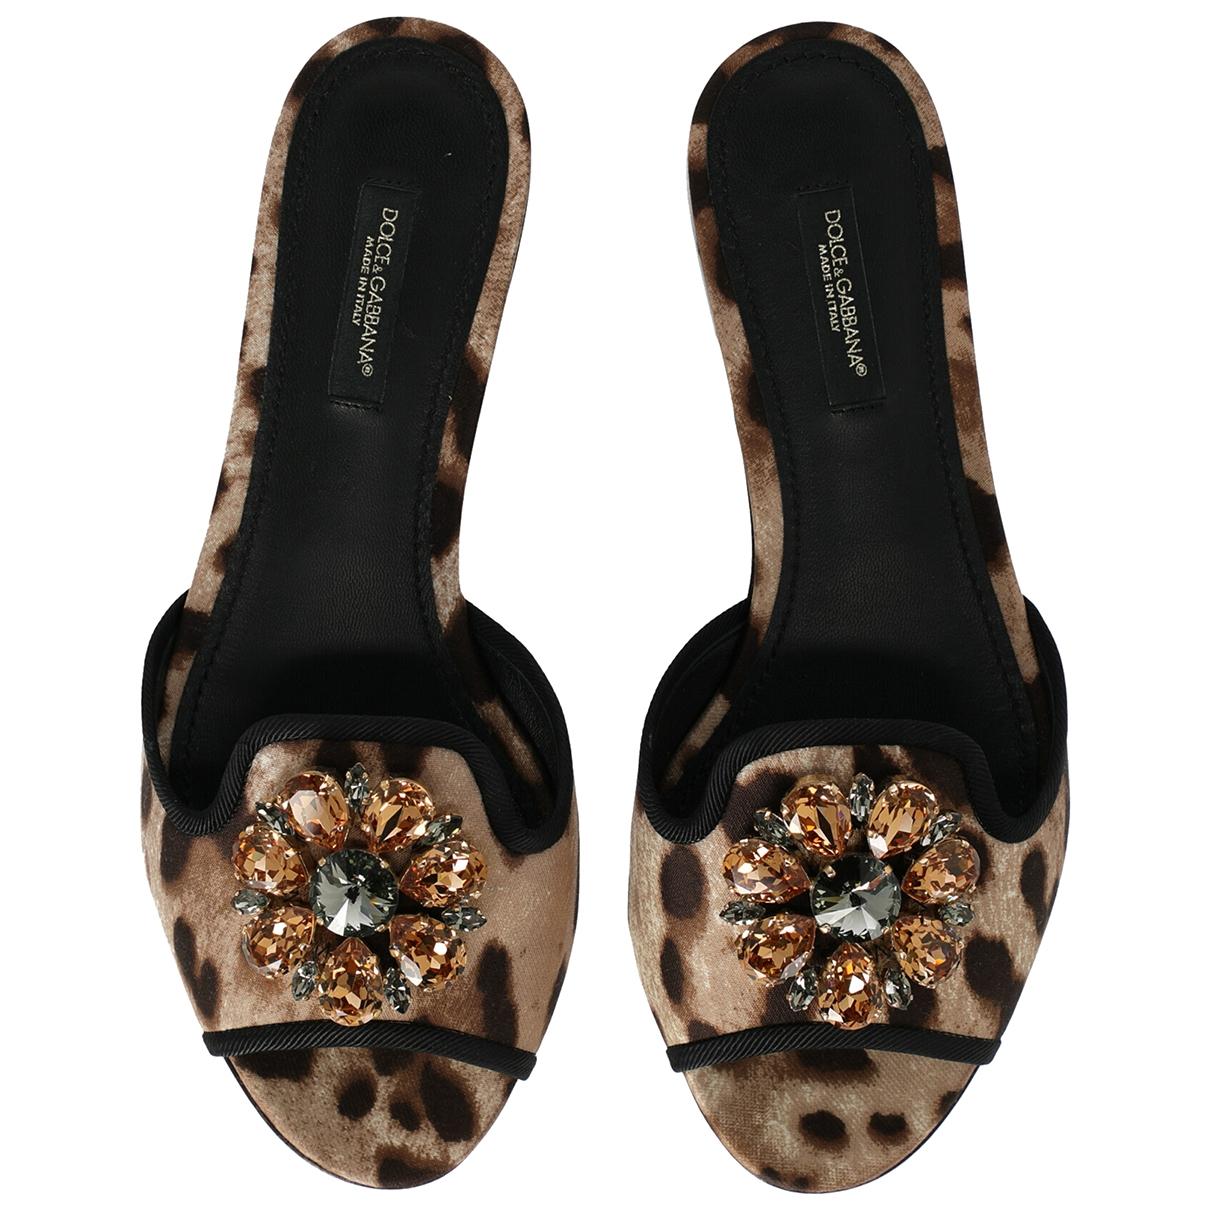 Zuecos de Lona Dolce & Gabbana